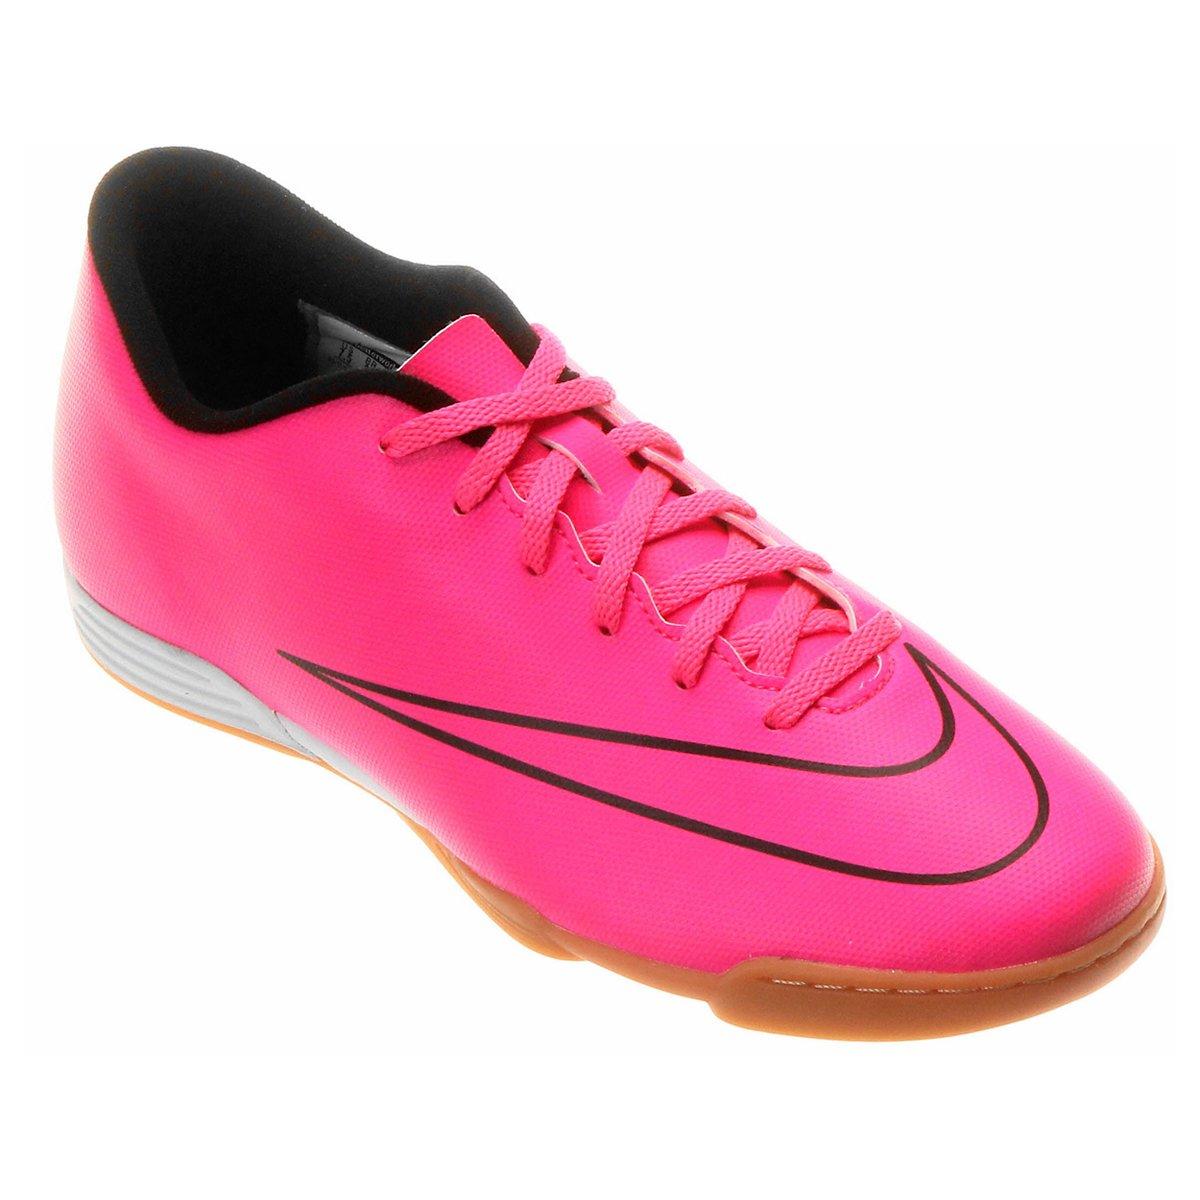 093020af1847d Chuteira Futsal Nike Mercurial Vortex 2 IC - Compre Agora   Loja do ...